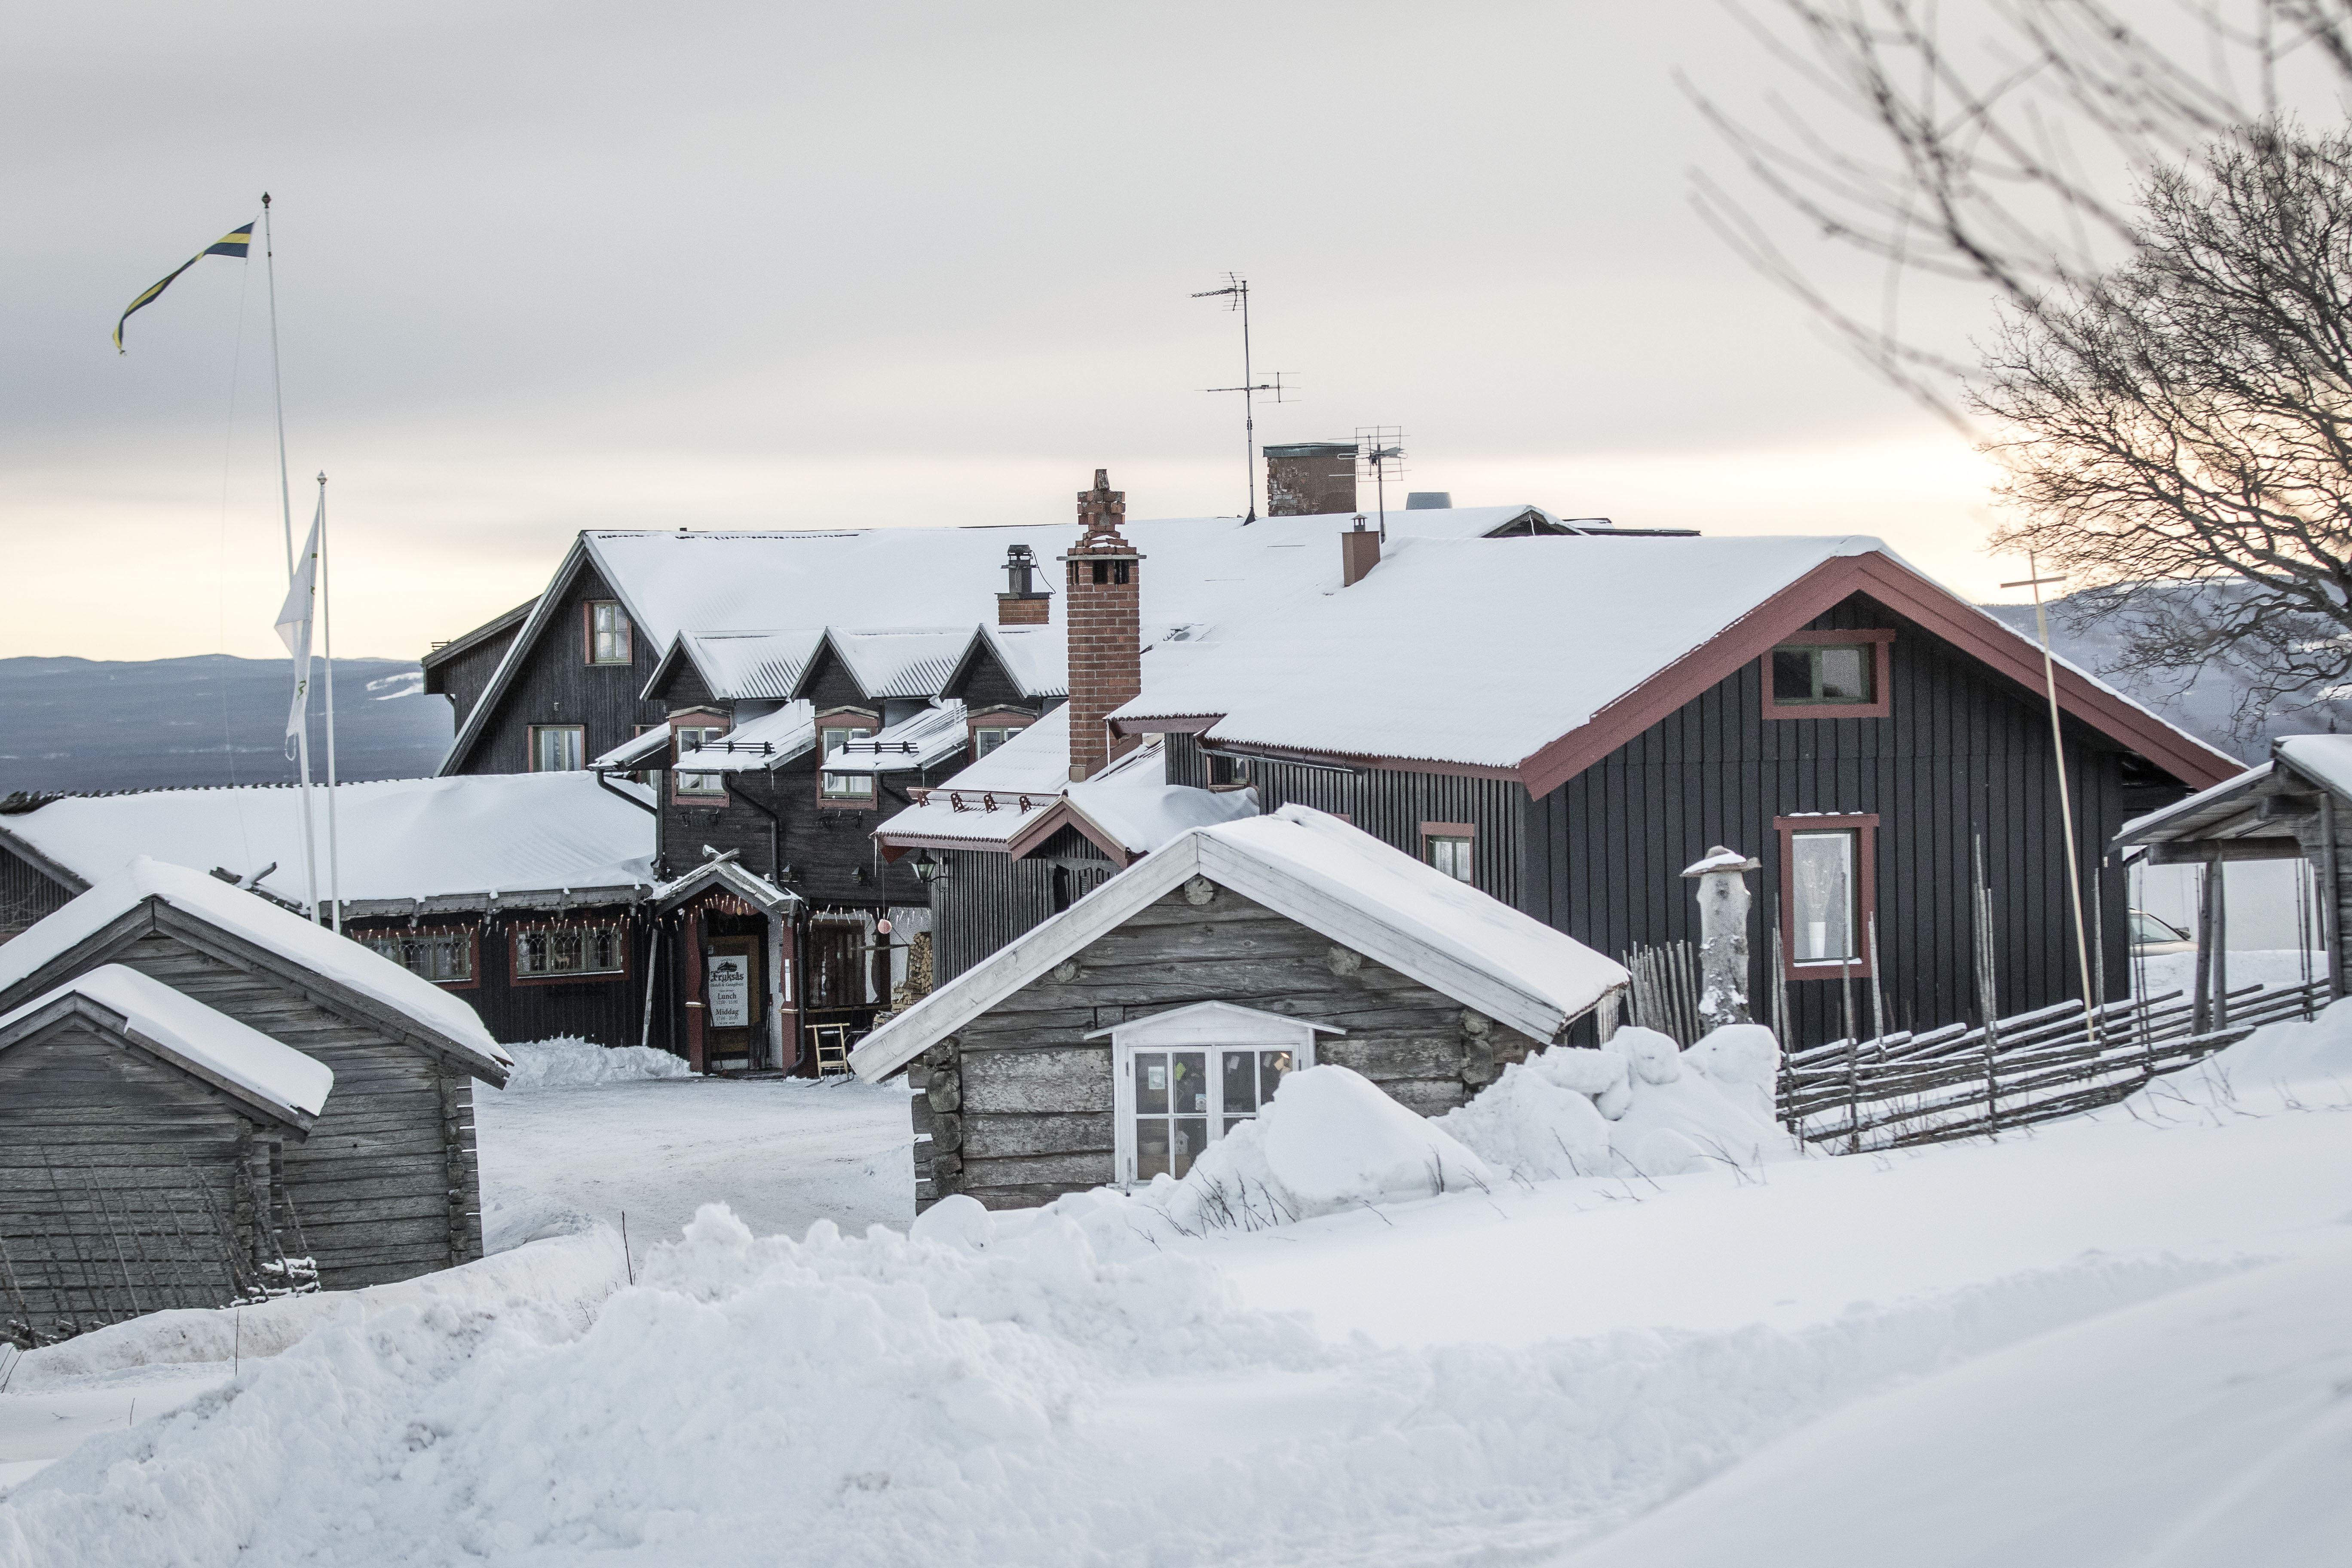 Fryksås Hotell